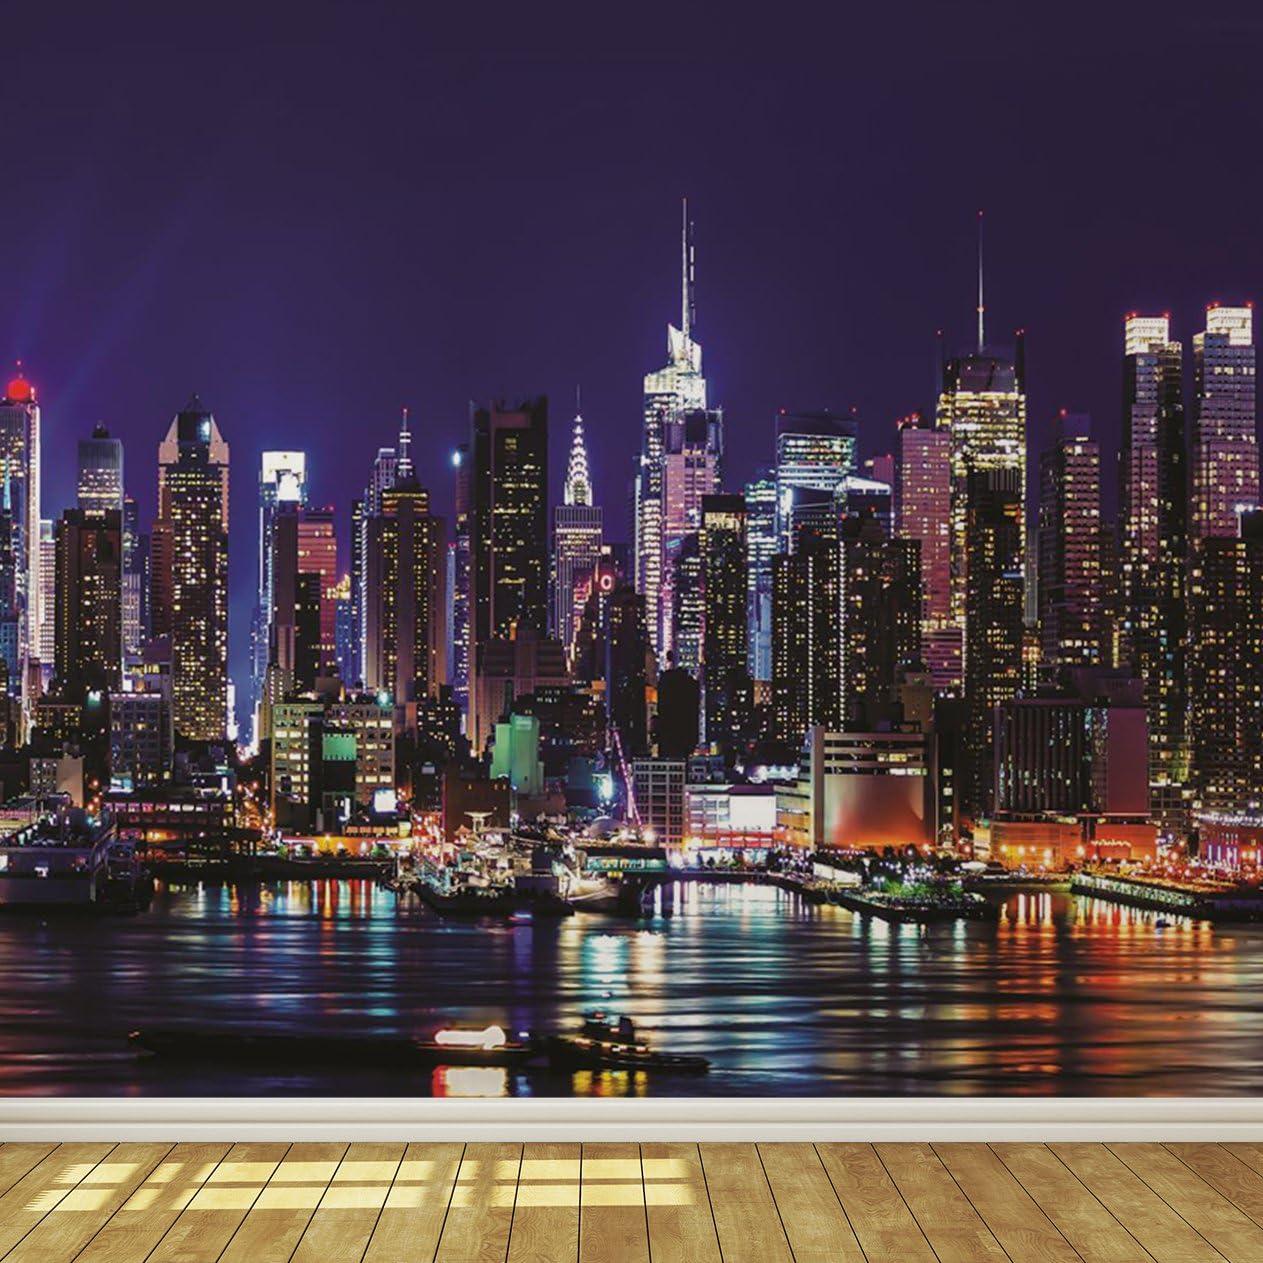 New York City Skyline Bei Nacht 7 Tapete Wandbild Papier 115 G M Xx Large 368 X 258 Cm B X H Amazon De Baumarkt